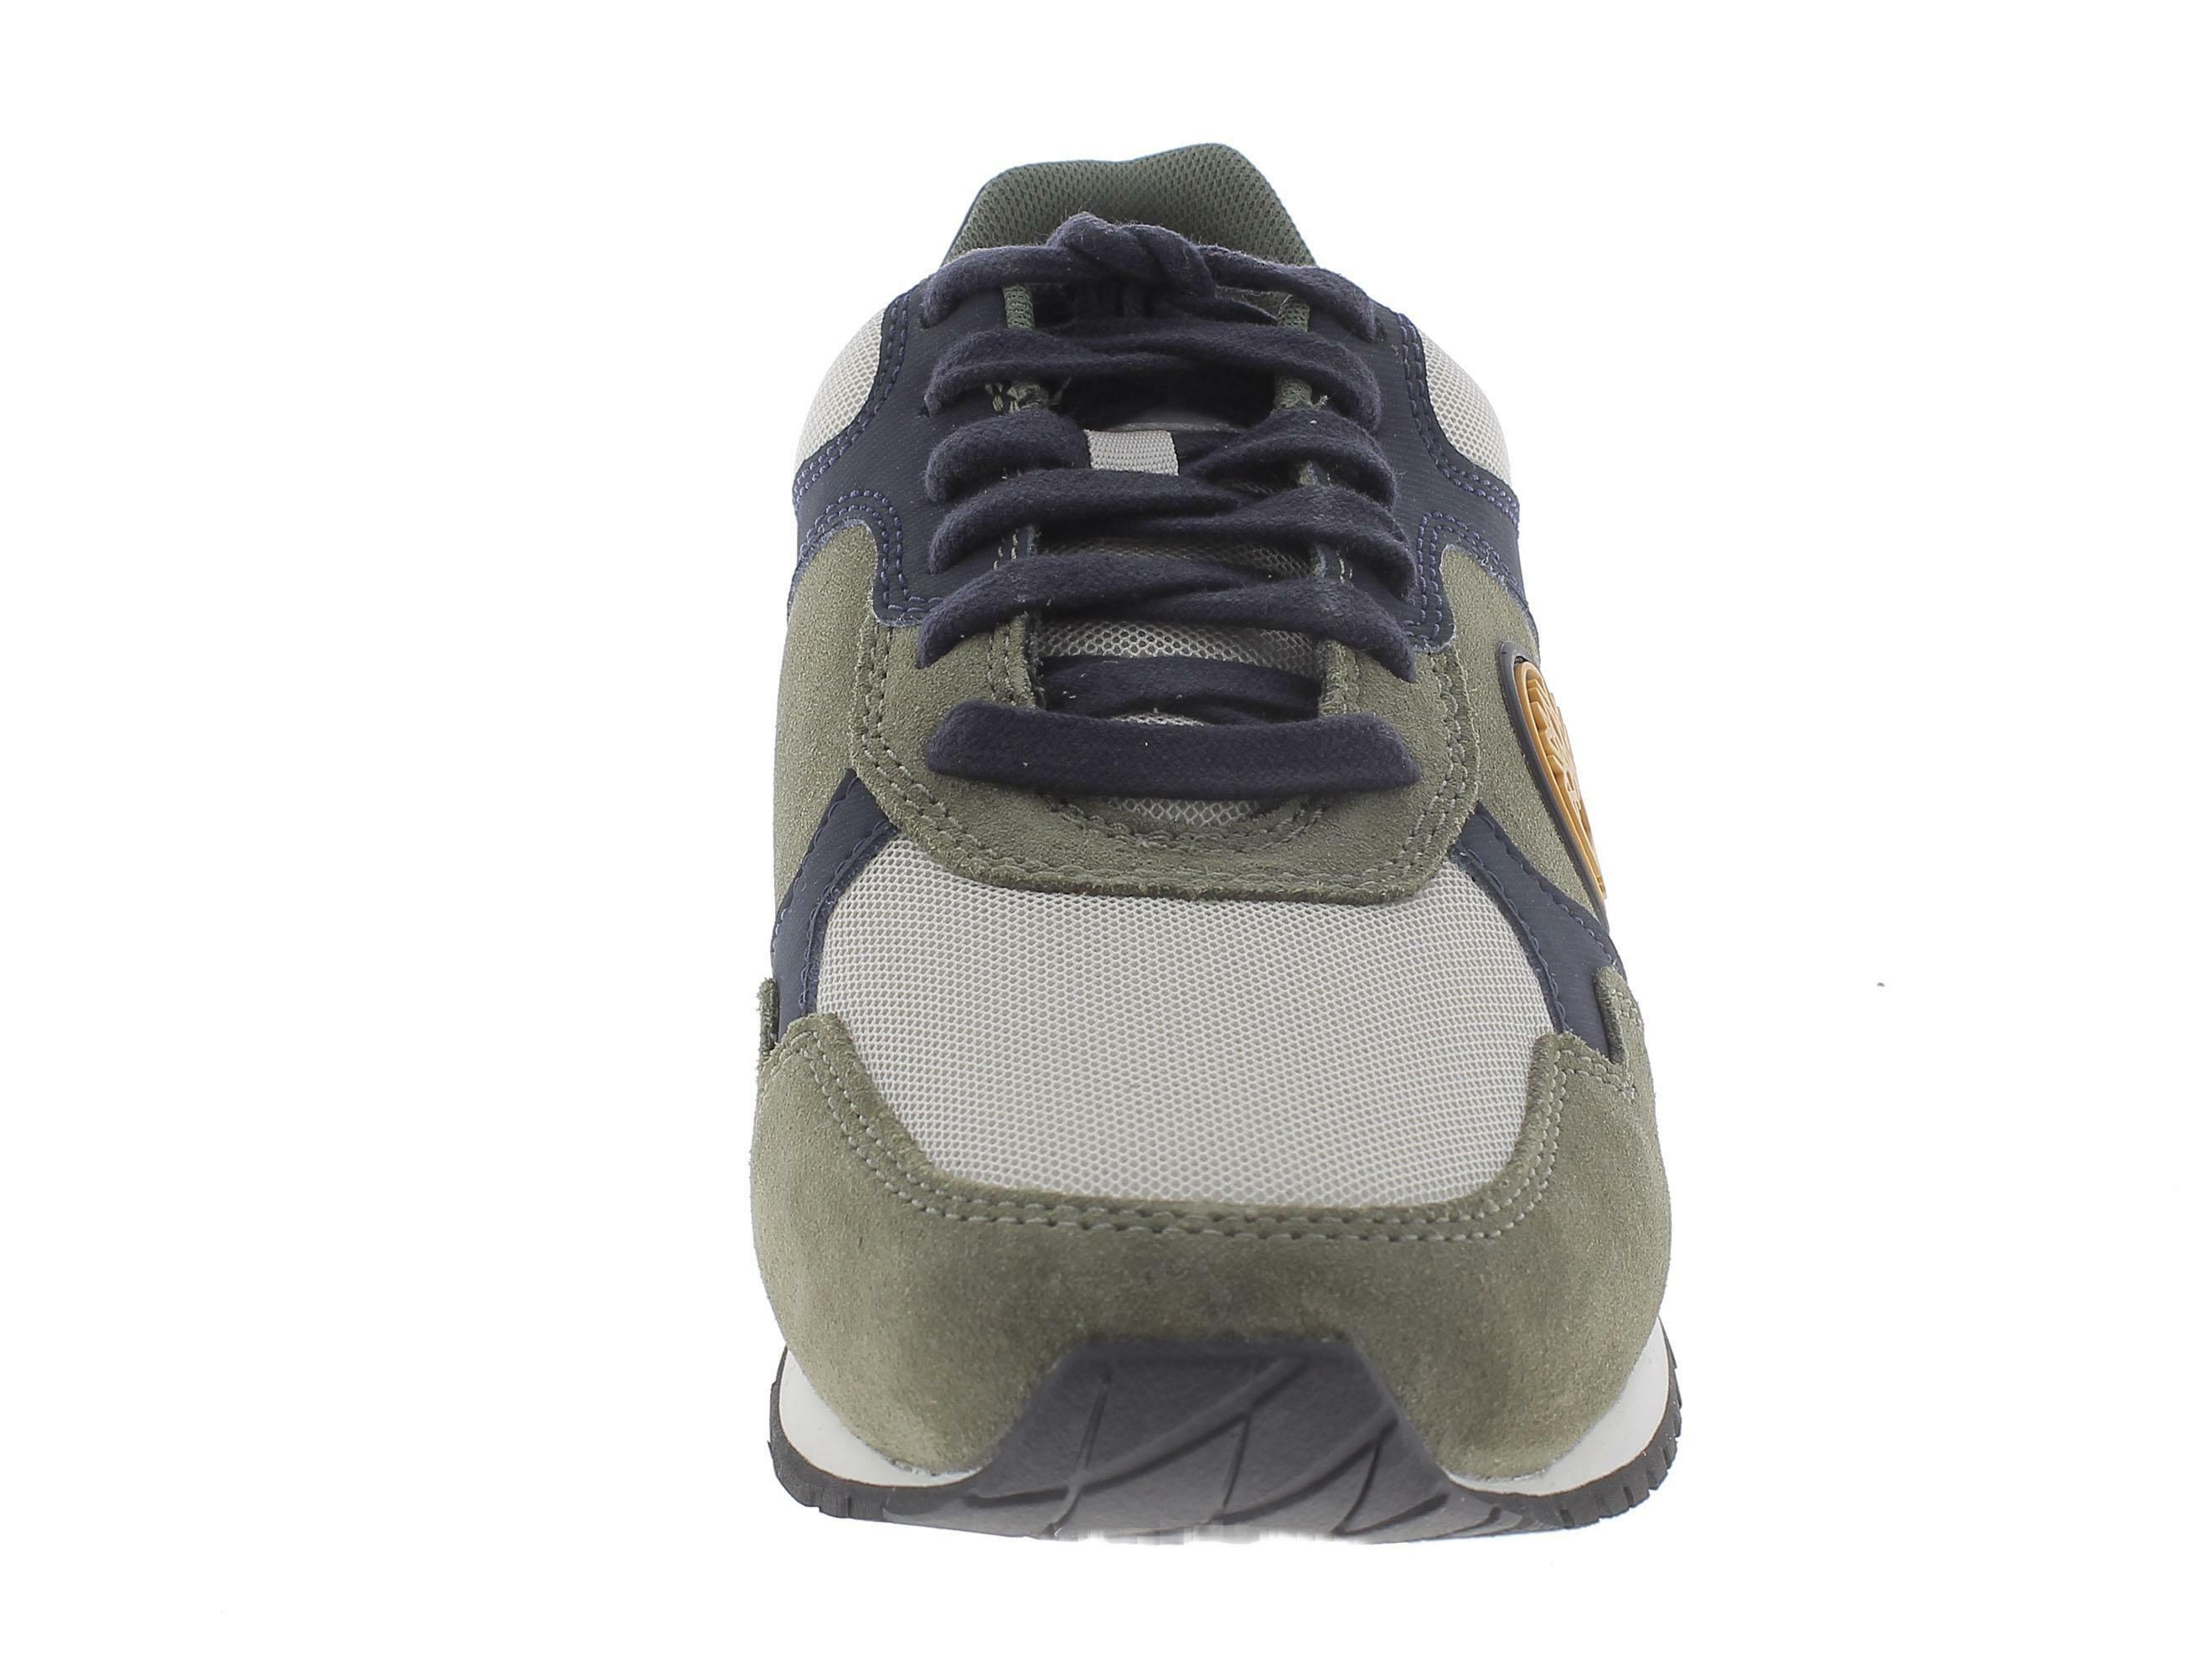 timberland scarpe estive, Timberland Retro Runner Oxford